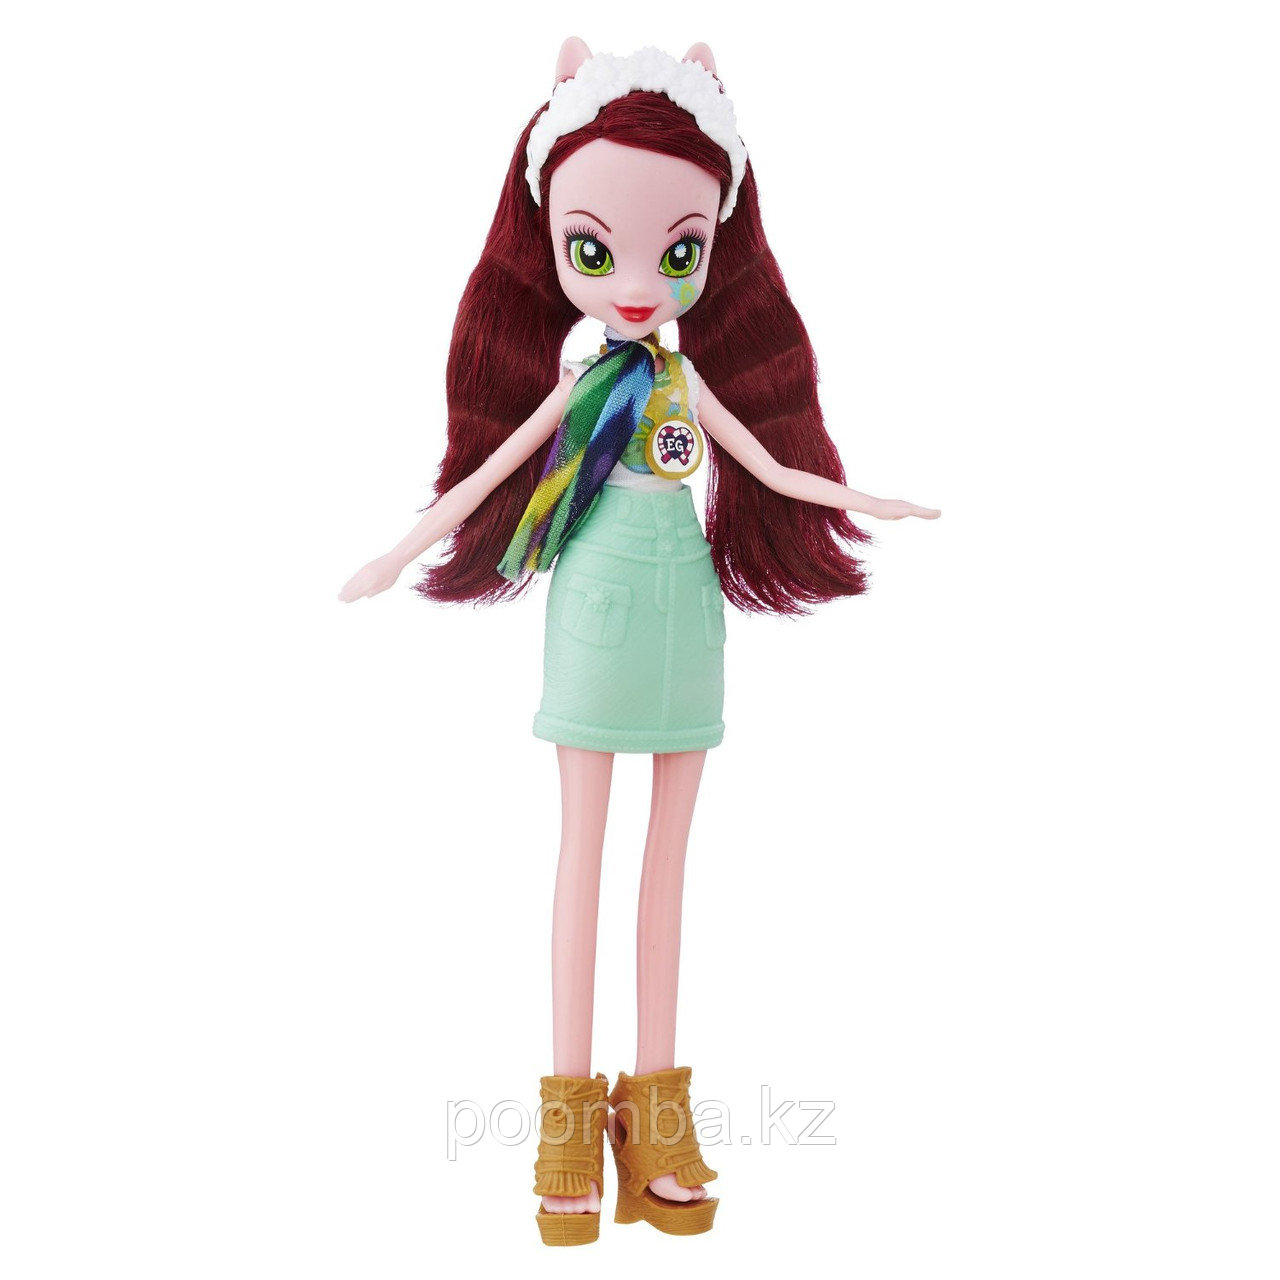 "Кукла Equestria Girls""Легенды вечнозеленого леса""Gloriosa Daisy"